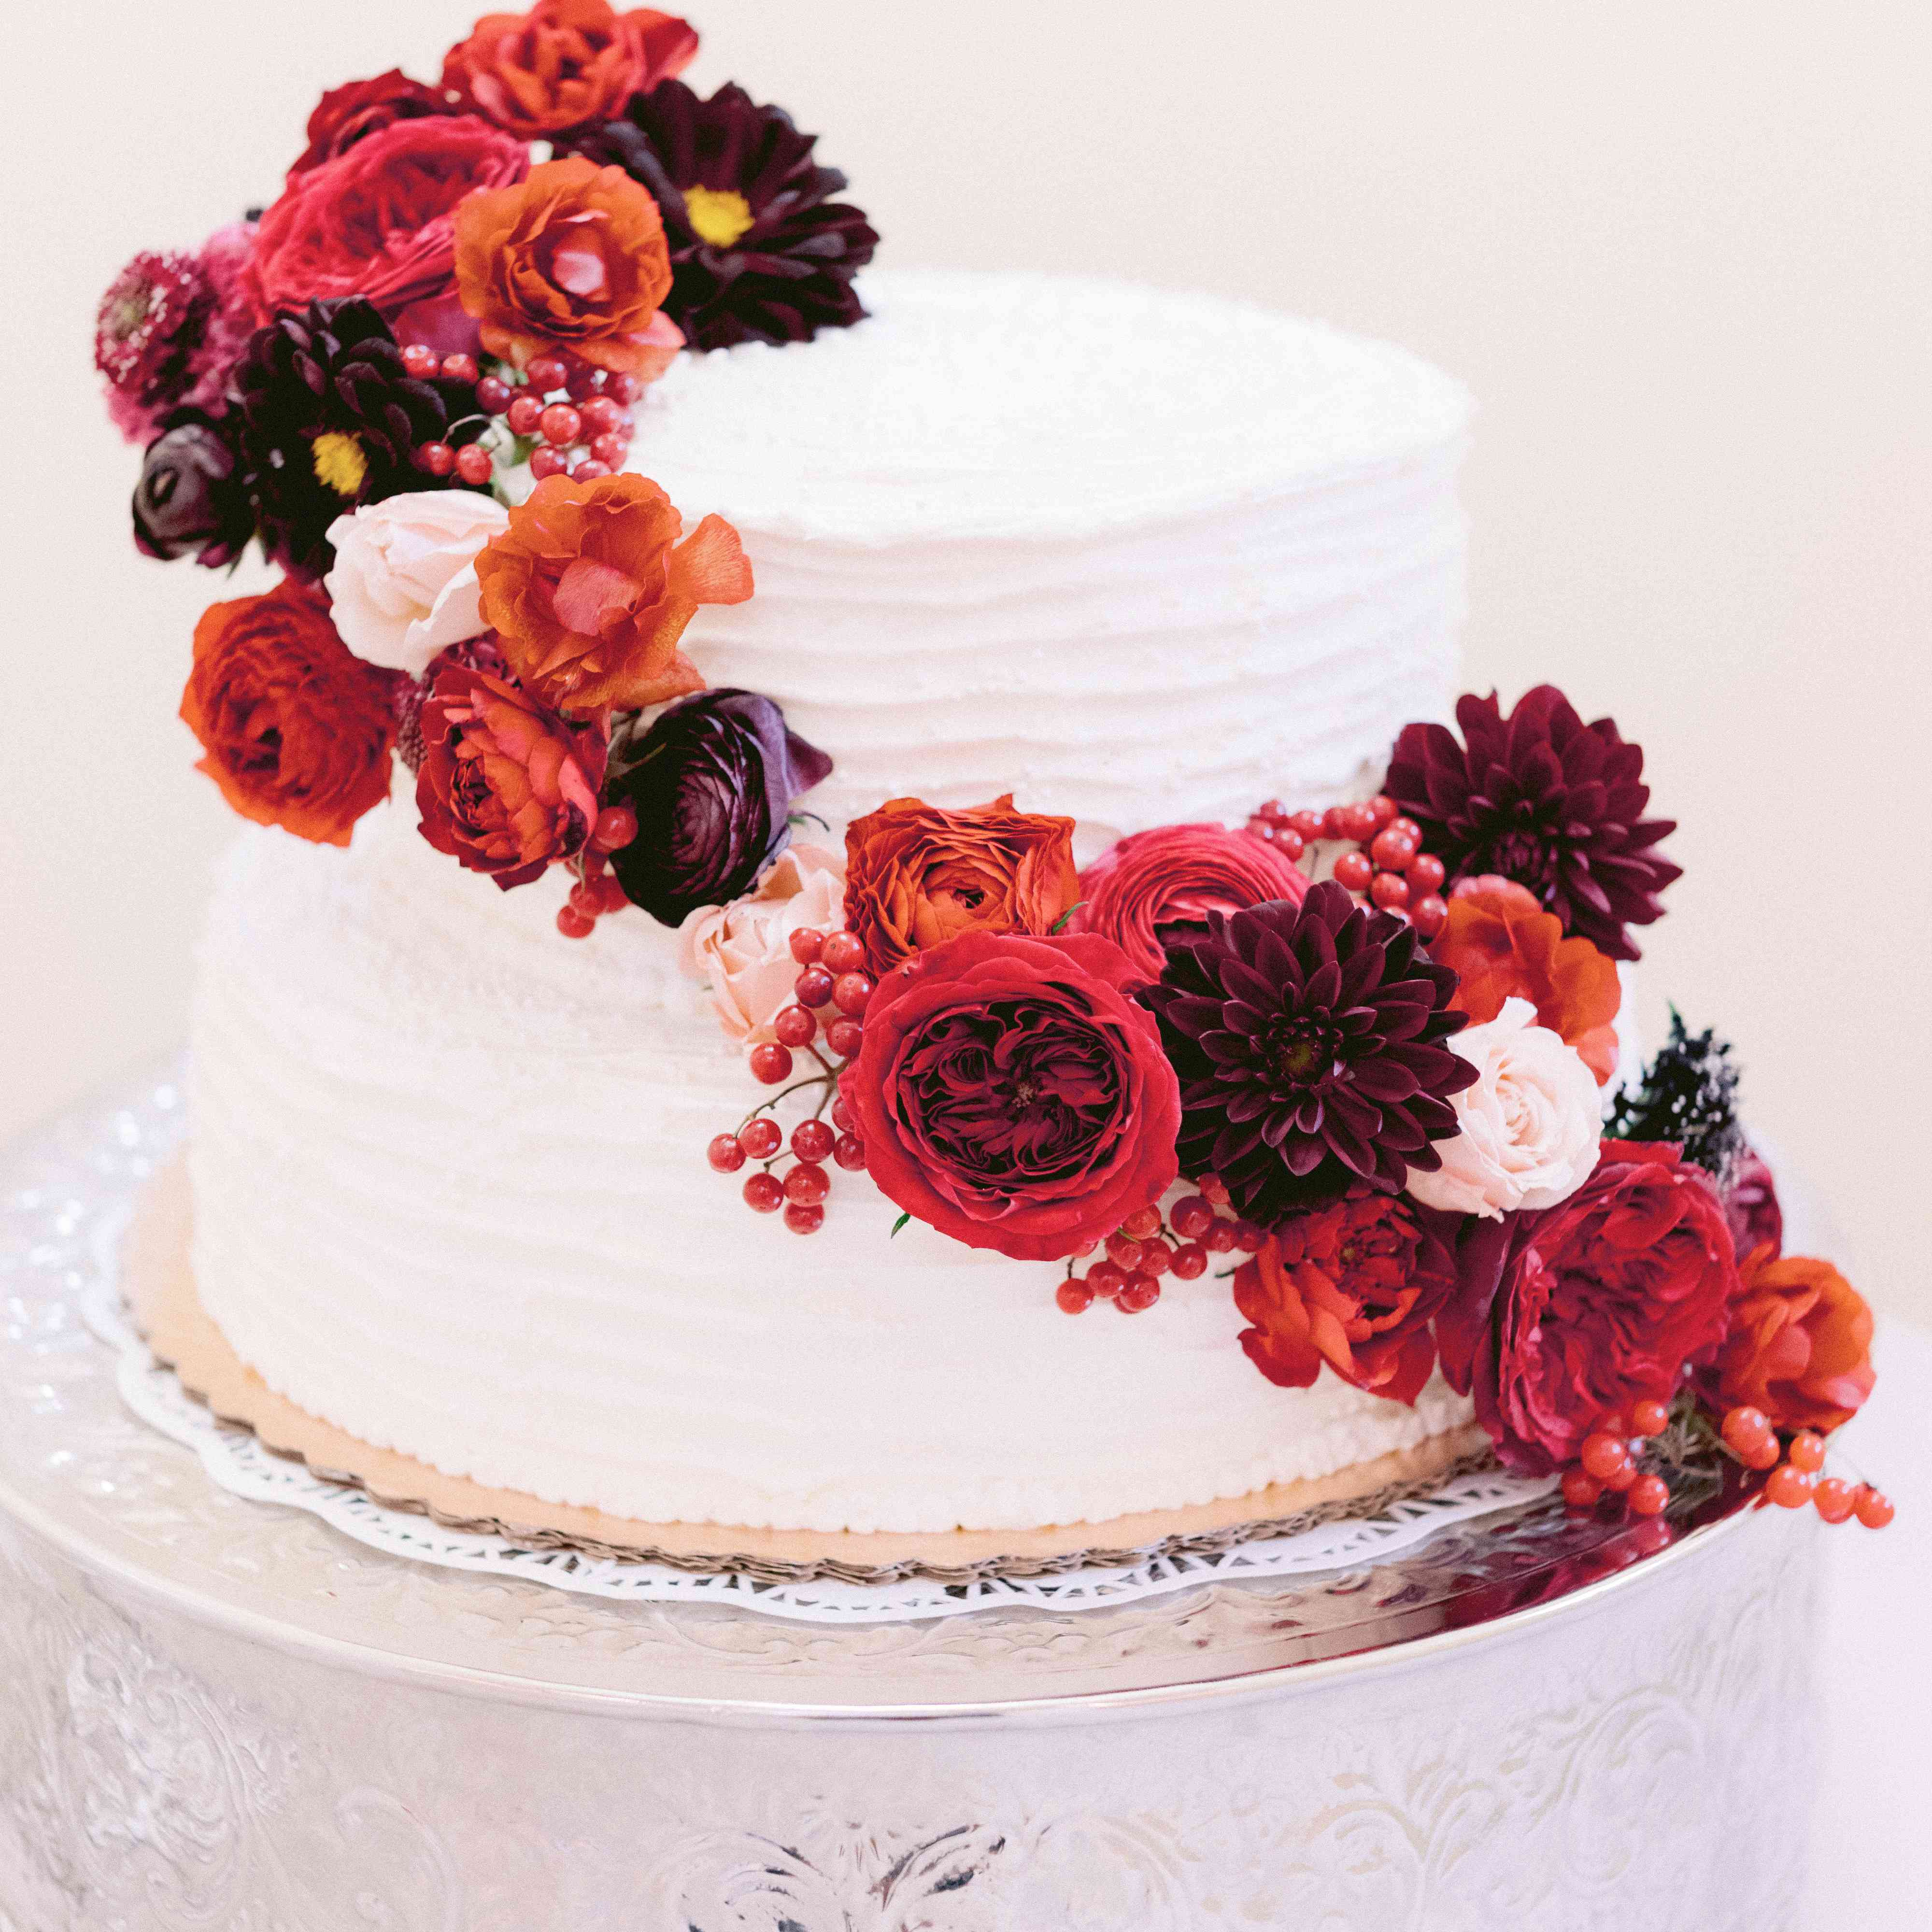 85 Of The Prettiest Floral Wedding Cakes,Bathroom Design Ideas 2017